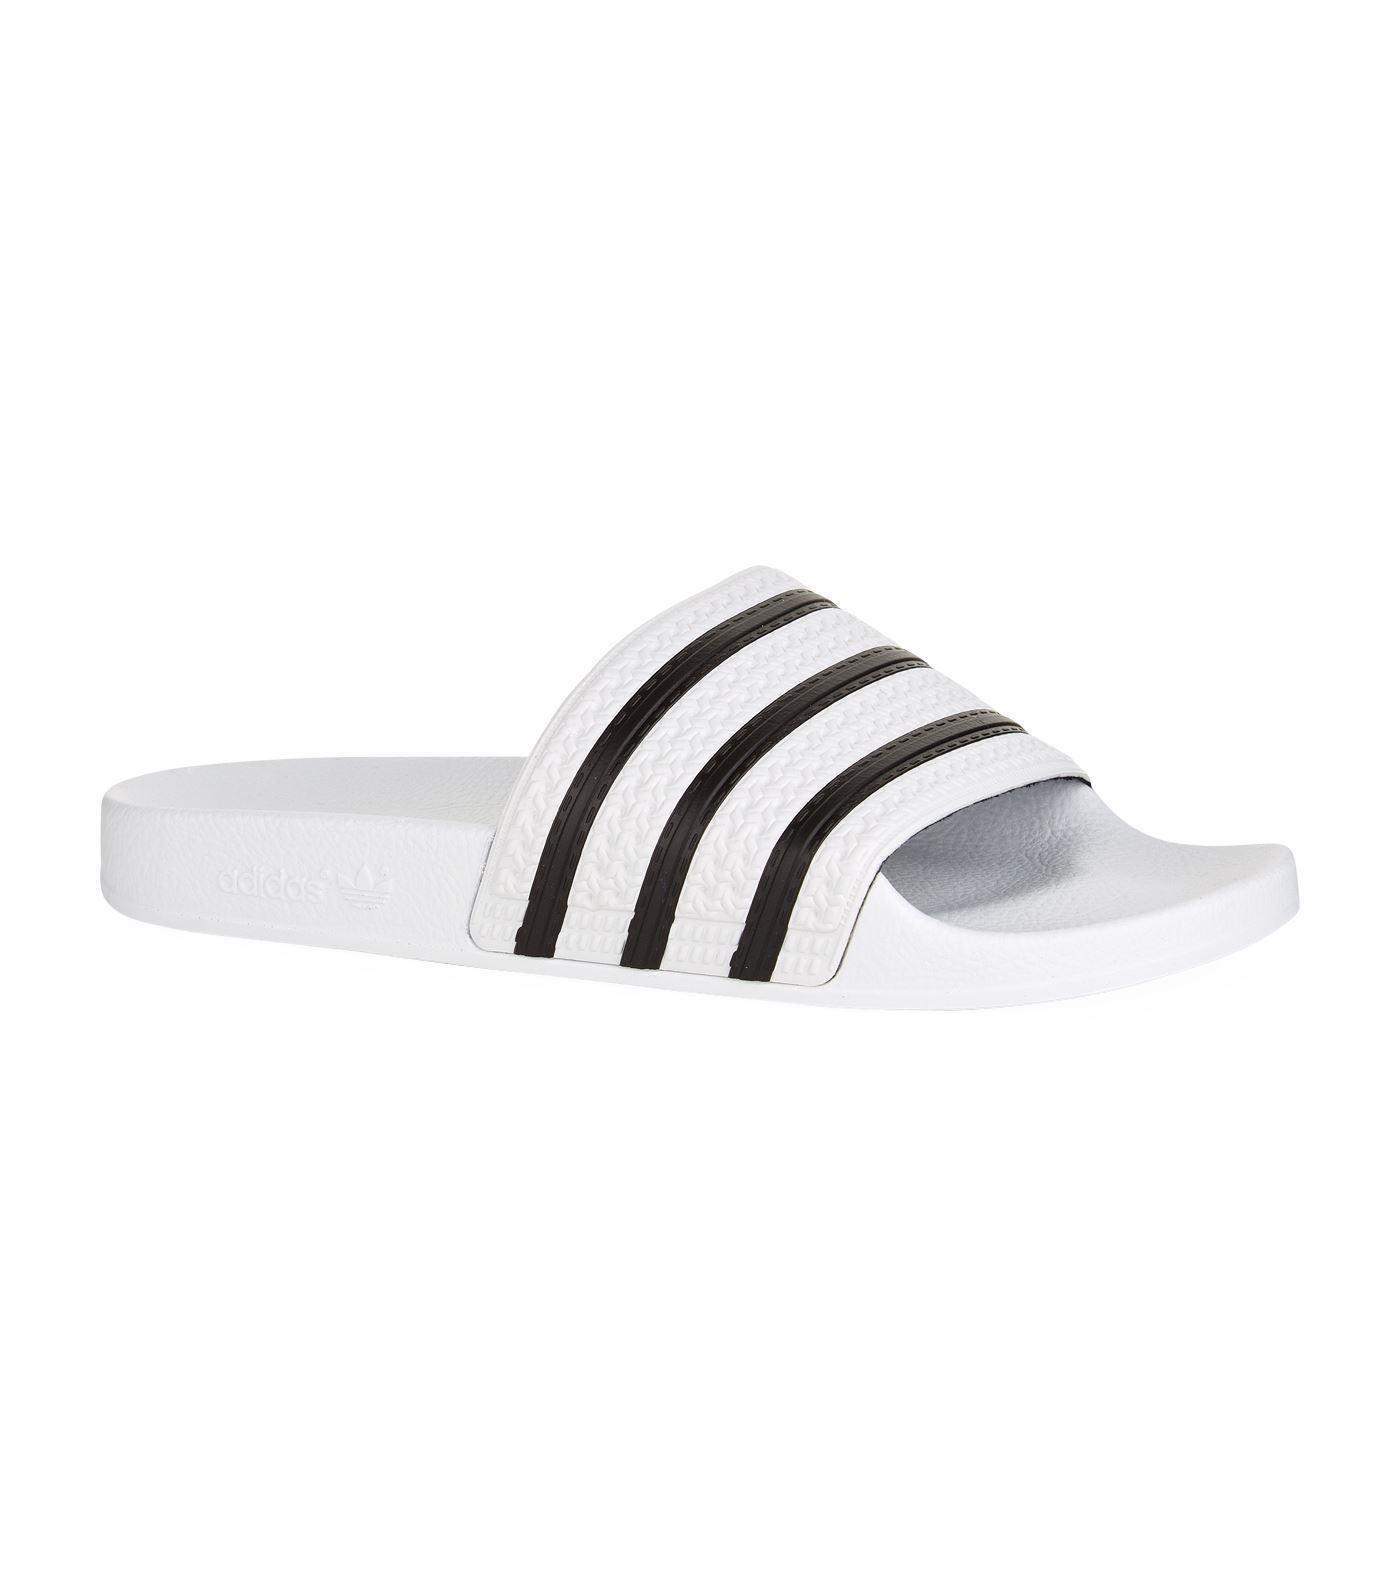 43725d610b4e6f Adidas Originals - White Sandals for Men - Lyst. View fullscreen